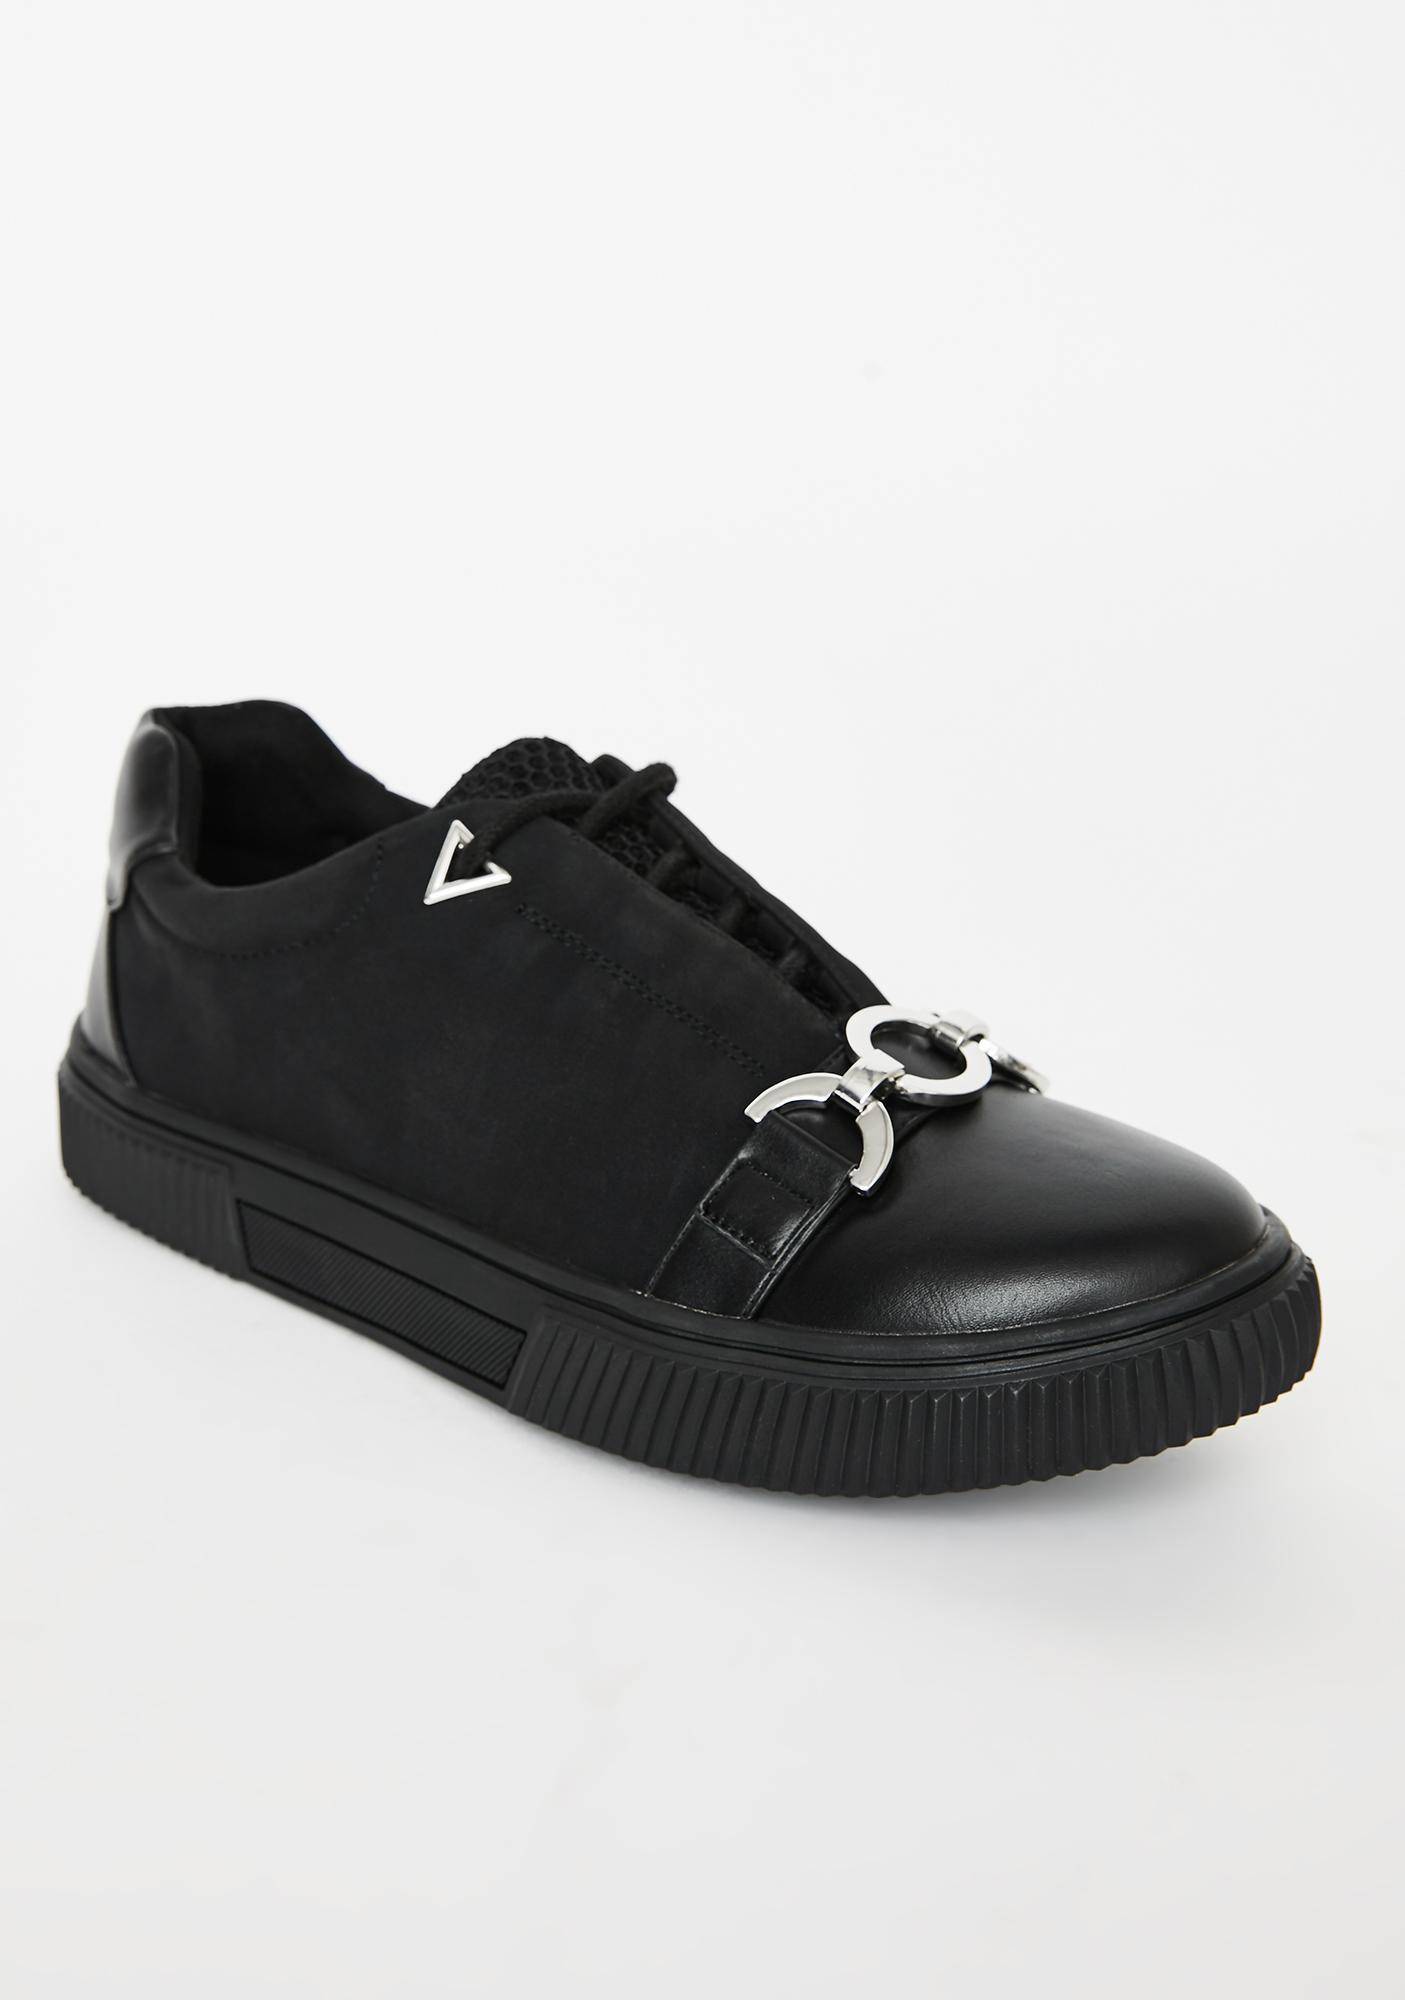 Disturbia Archetype Creeper Sneakers